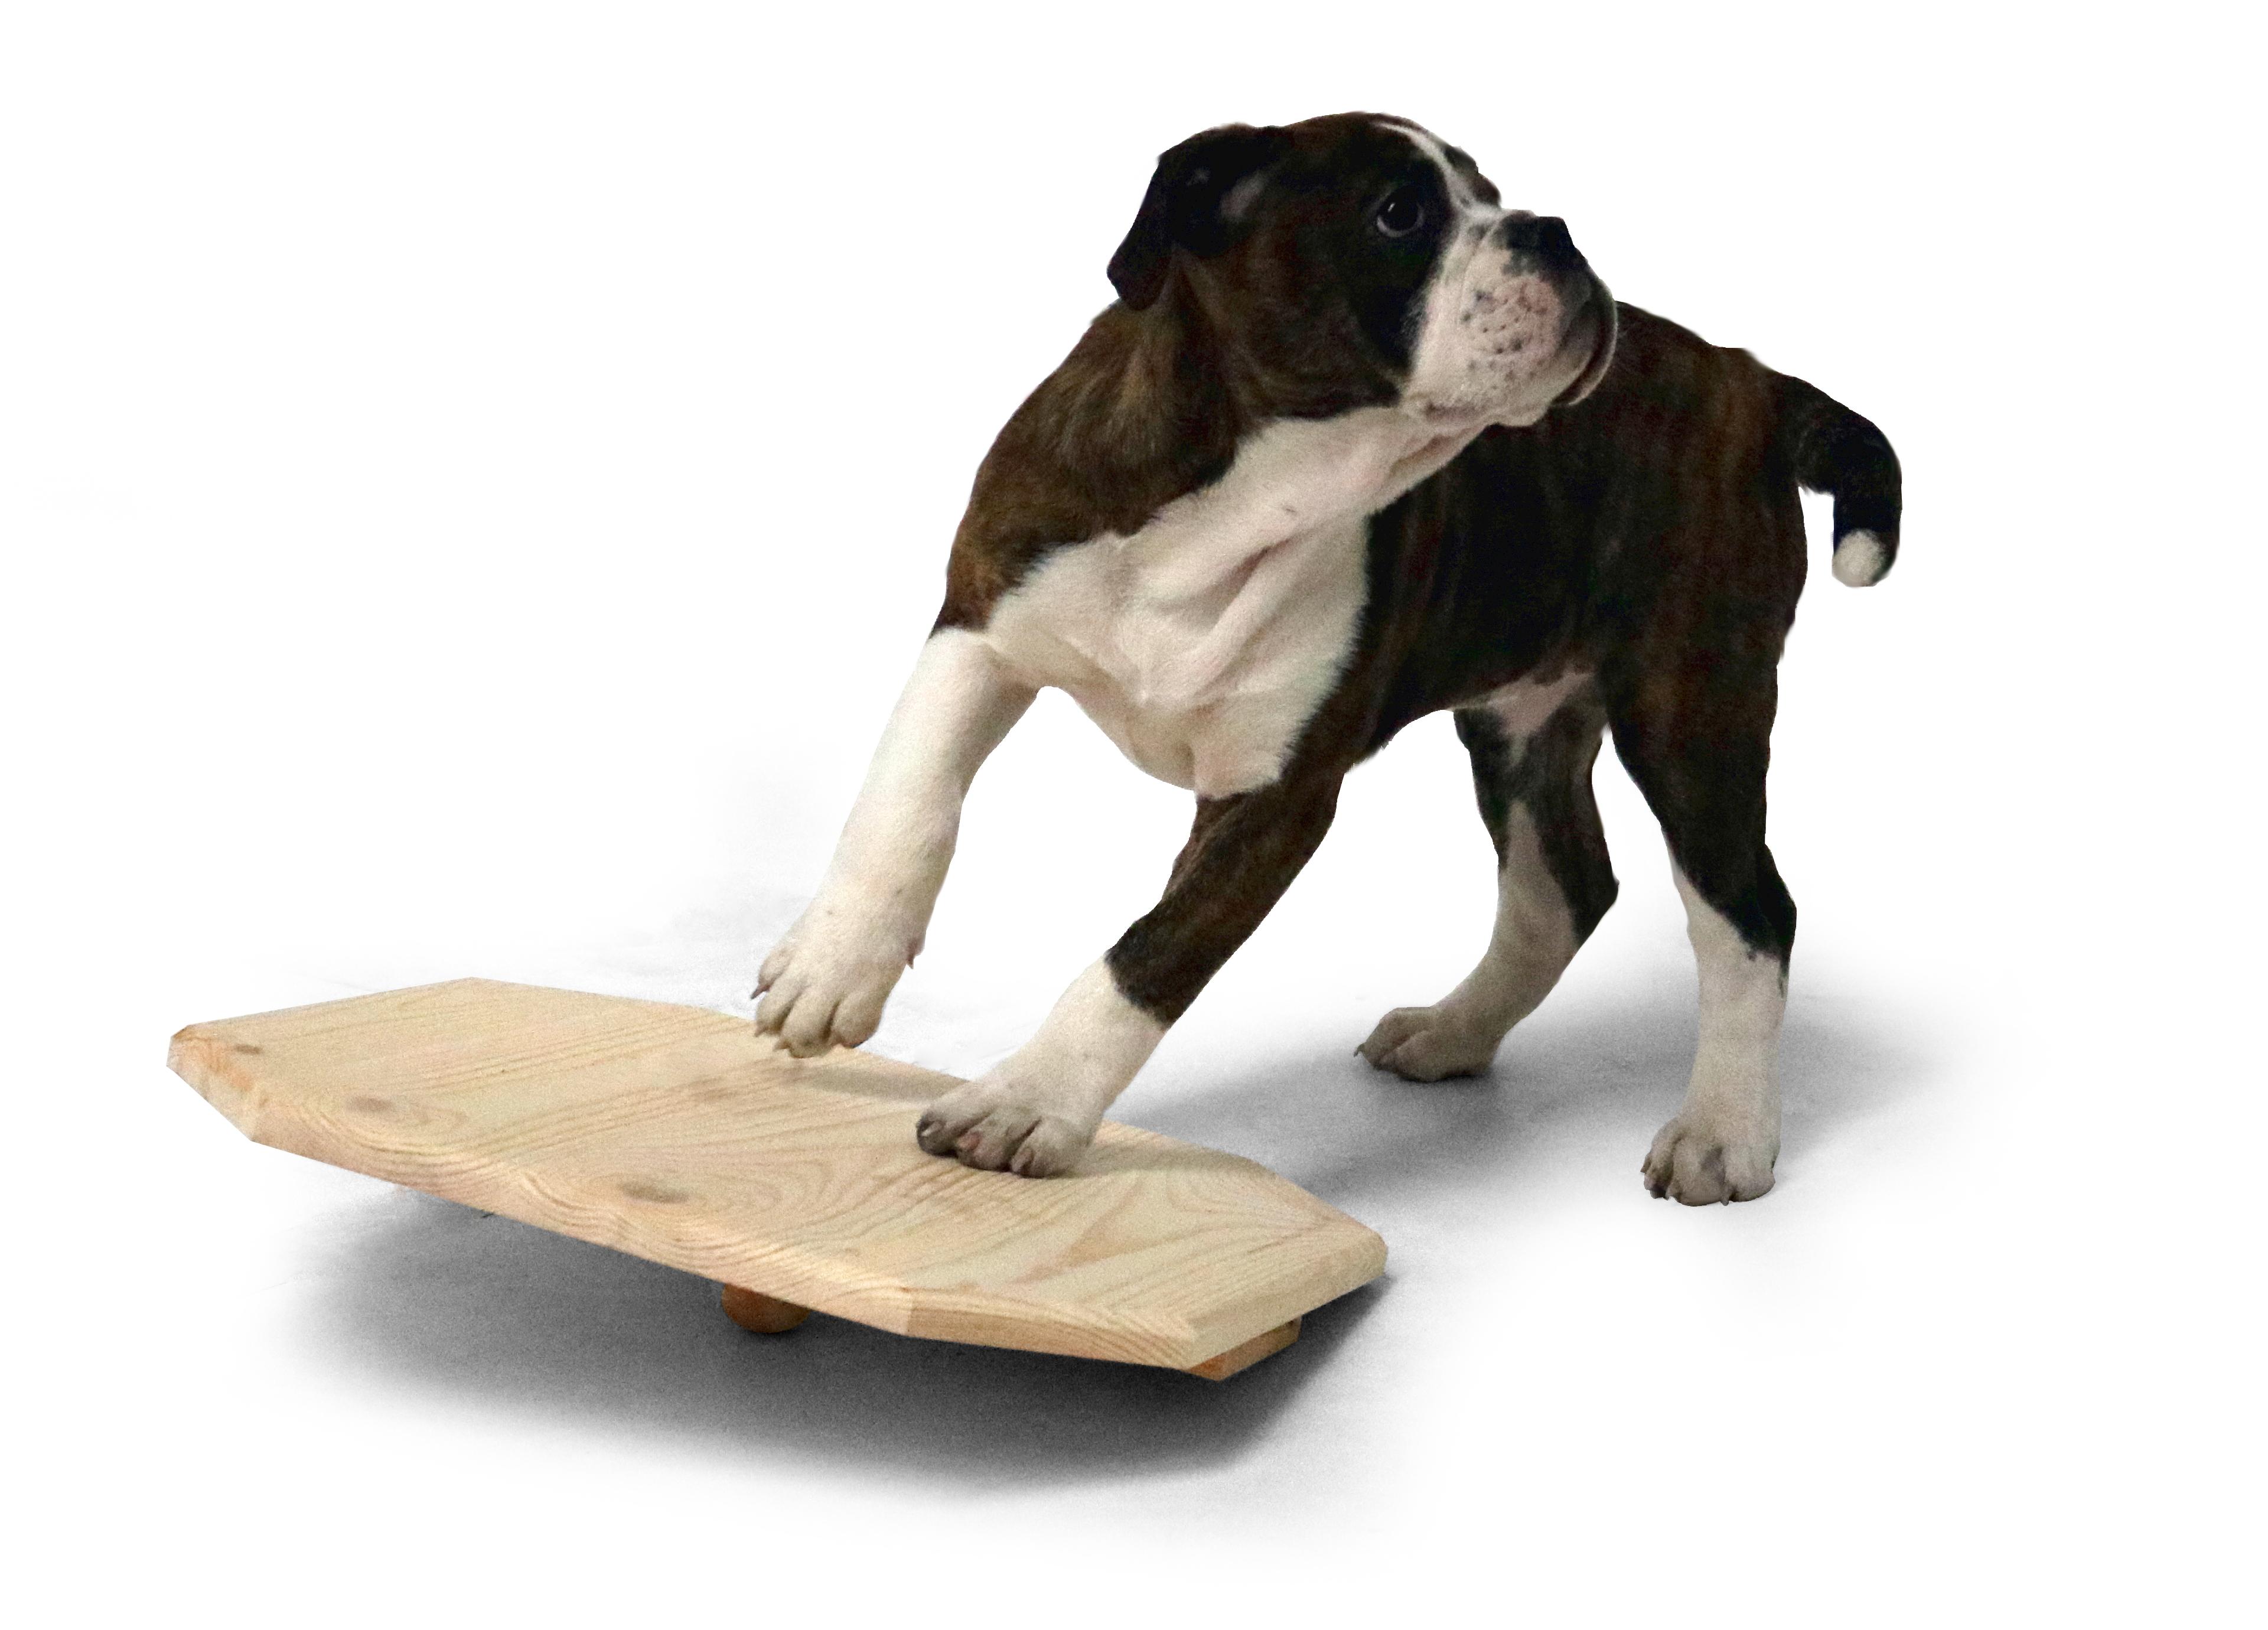 Welpen-Wackelbrett 40x40 cm aus Holz naturbelassen, Activity Motorik-Spielzeug für Hunde